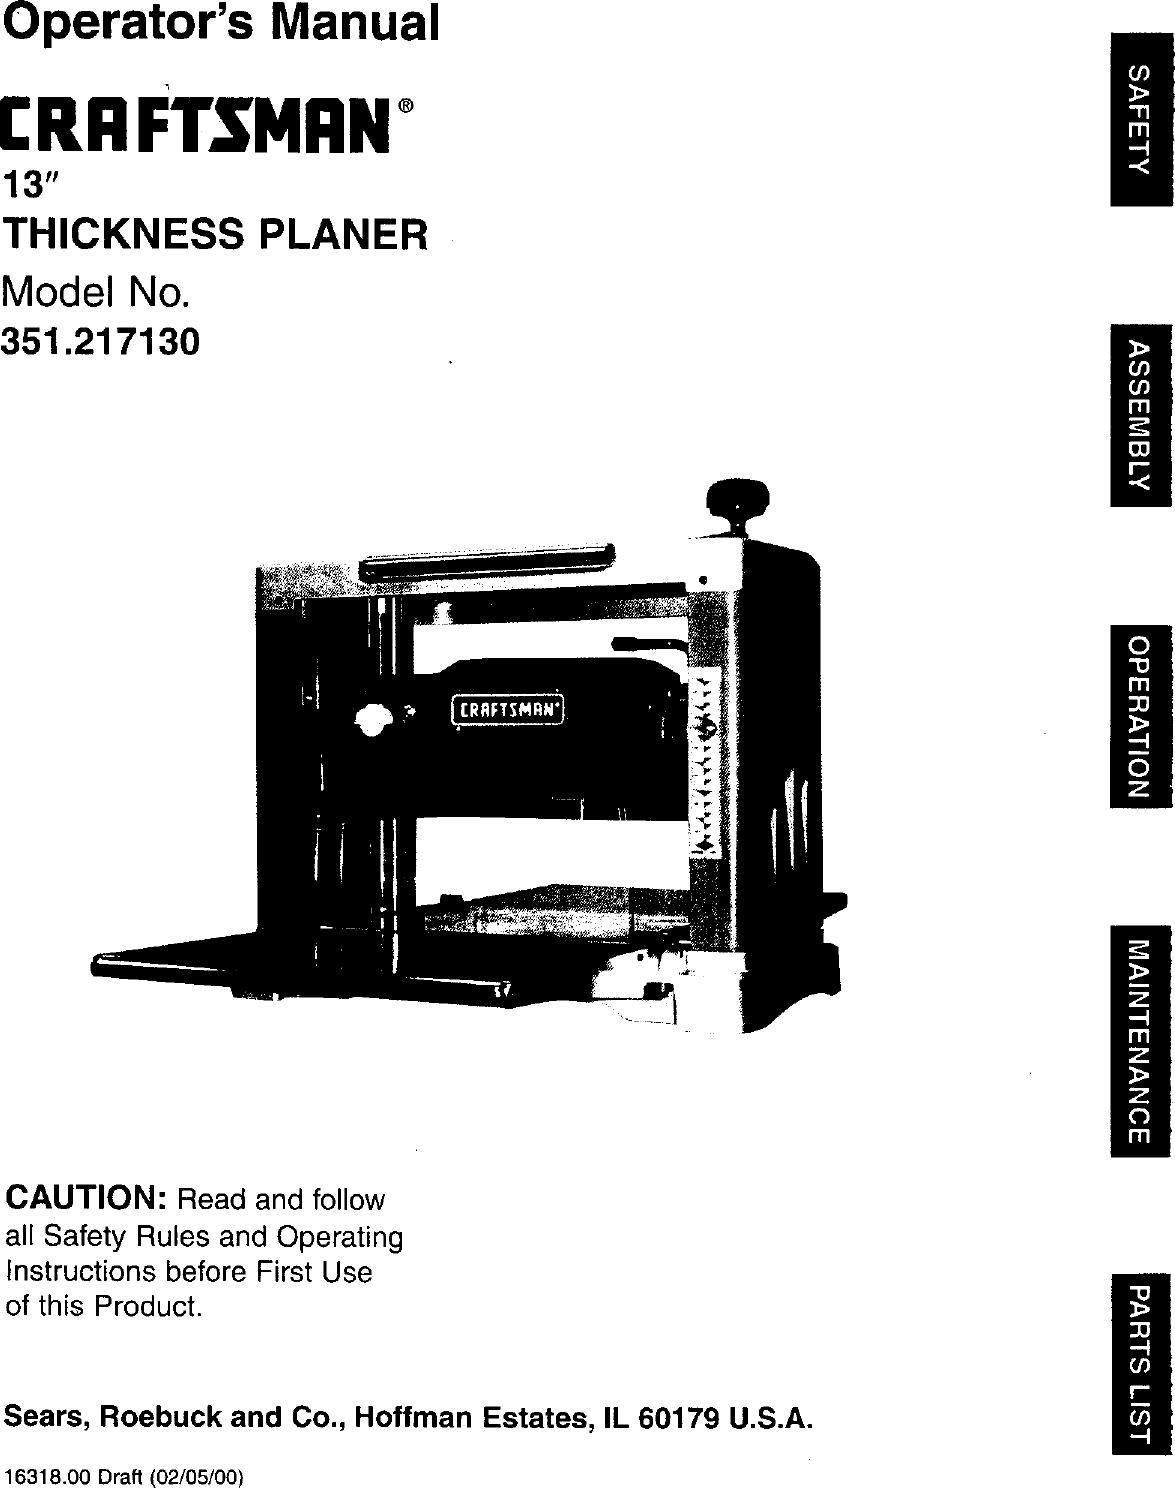 Craftsman 351217130 User Manual 13 JOINTER/PLANER Manuals